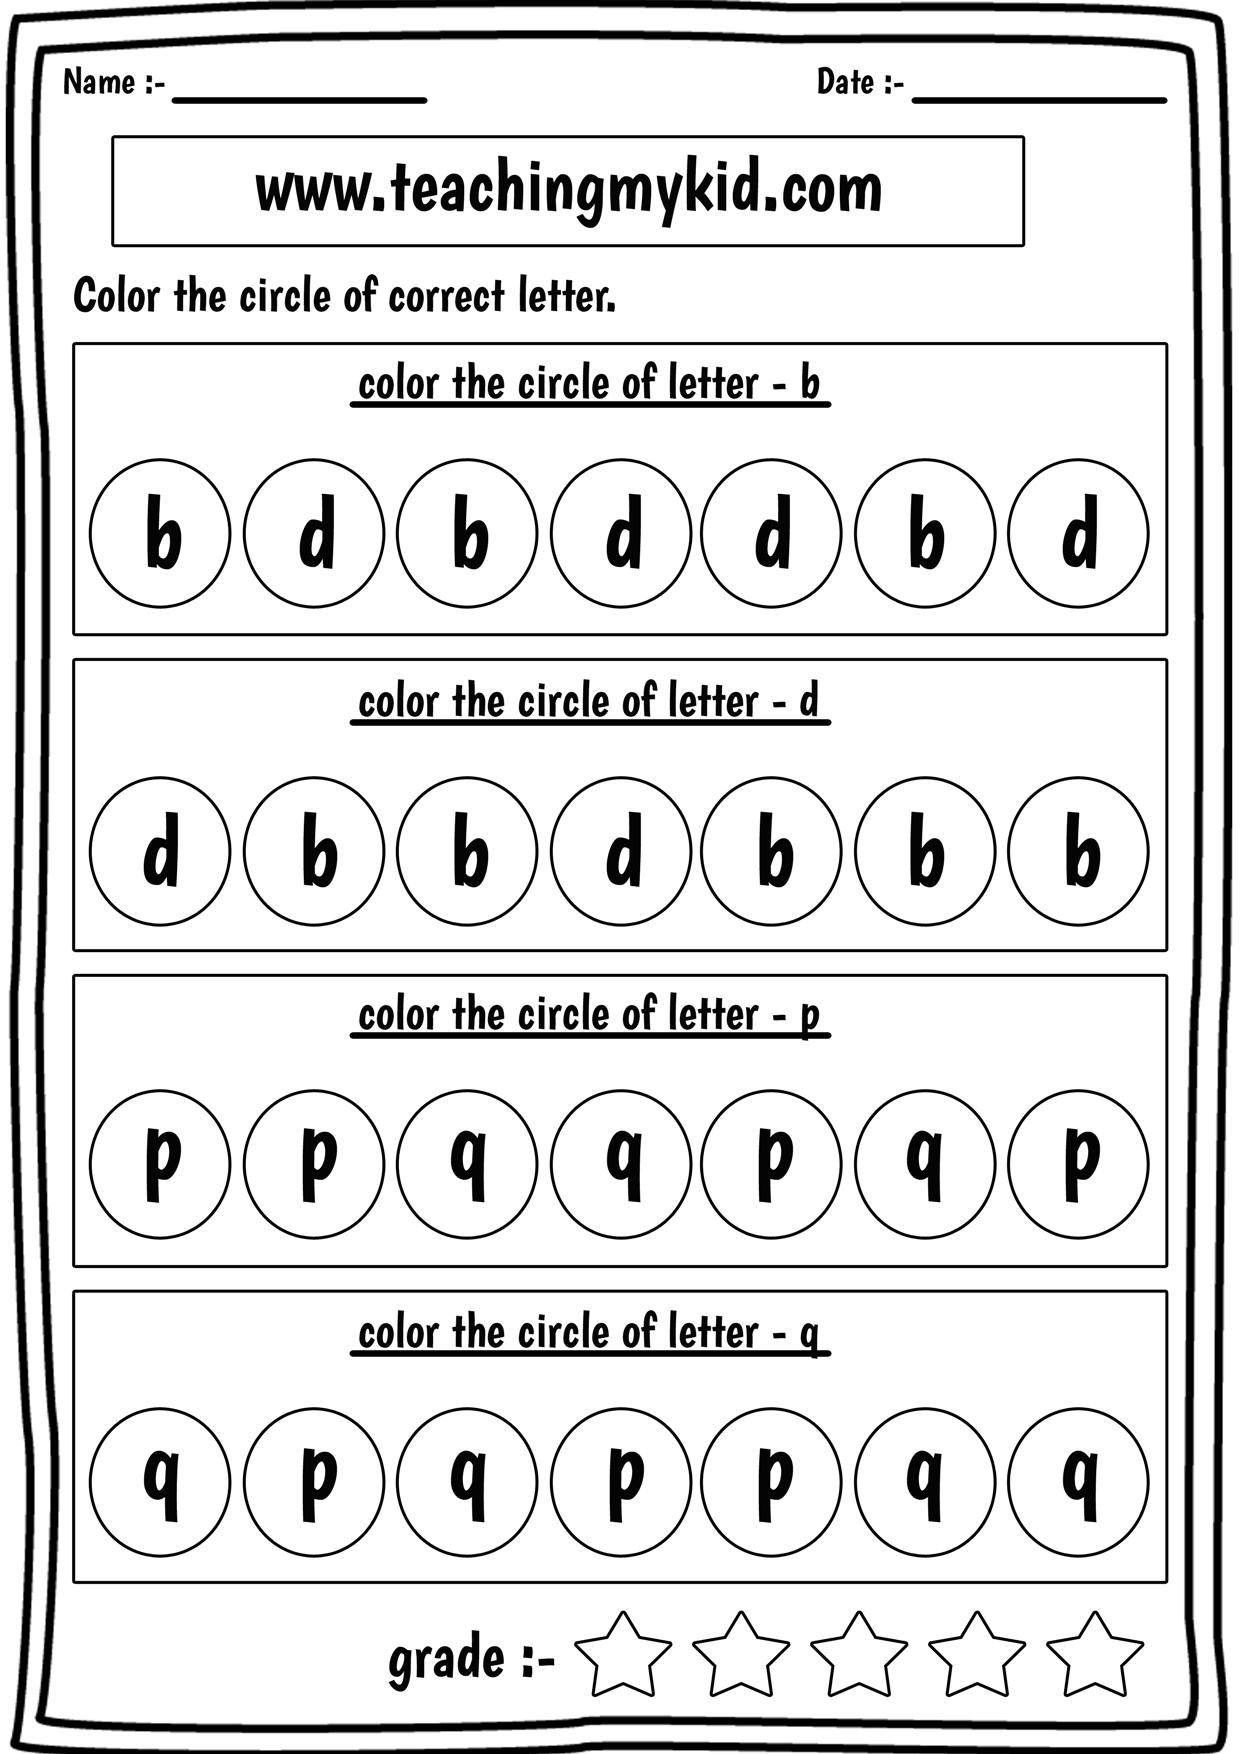 preschool printable worksheets confusing letters b,d,p,q